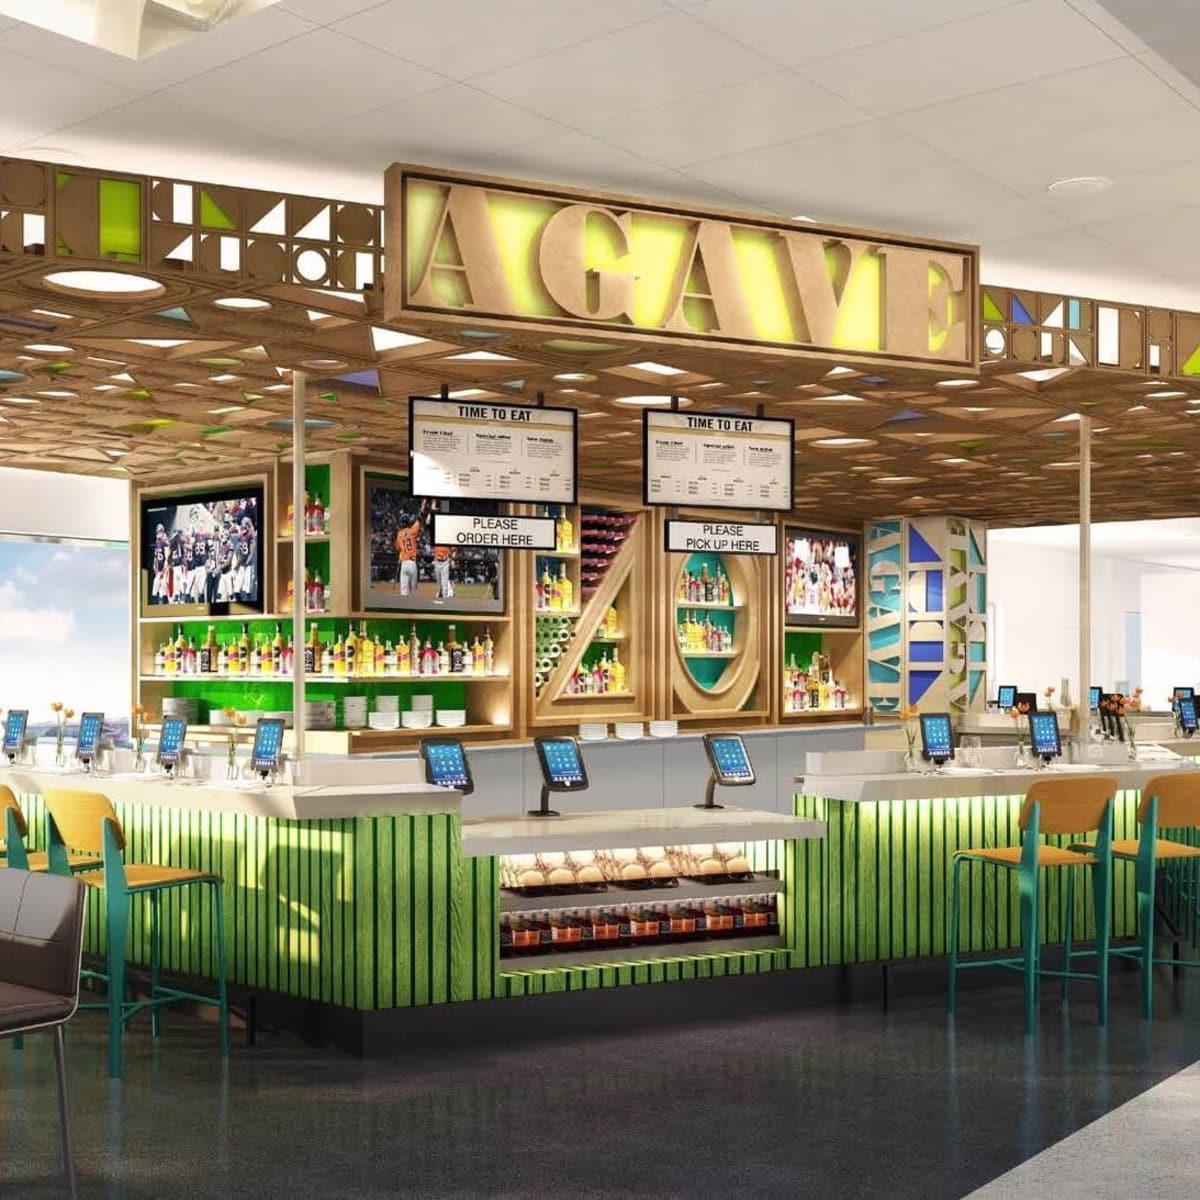 Agave restaurant at Bush Intercontinental Airport